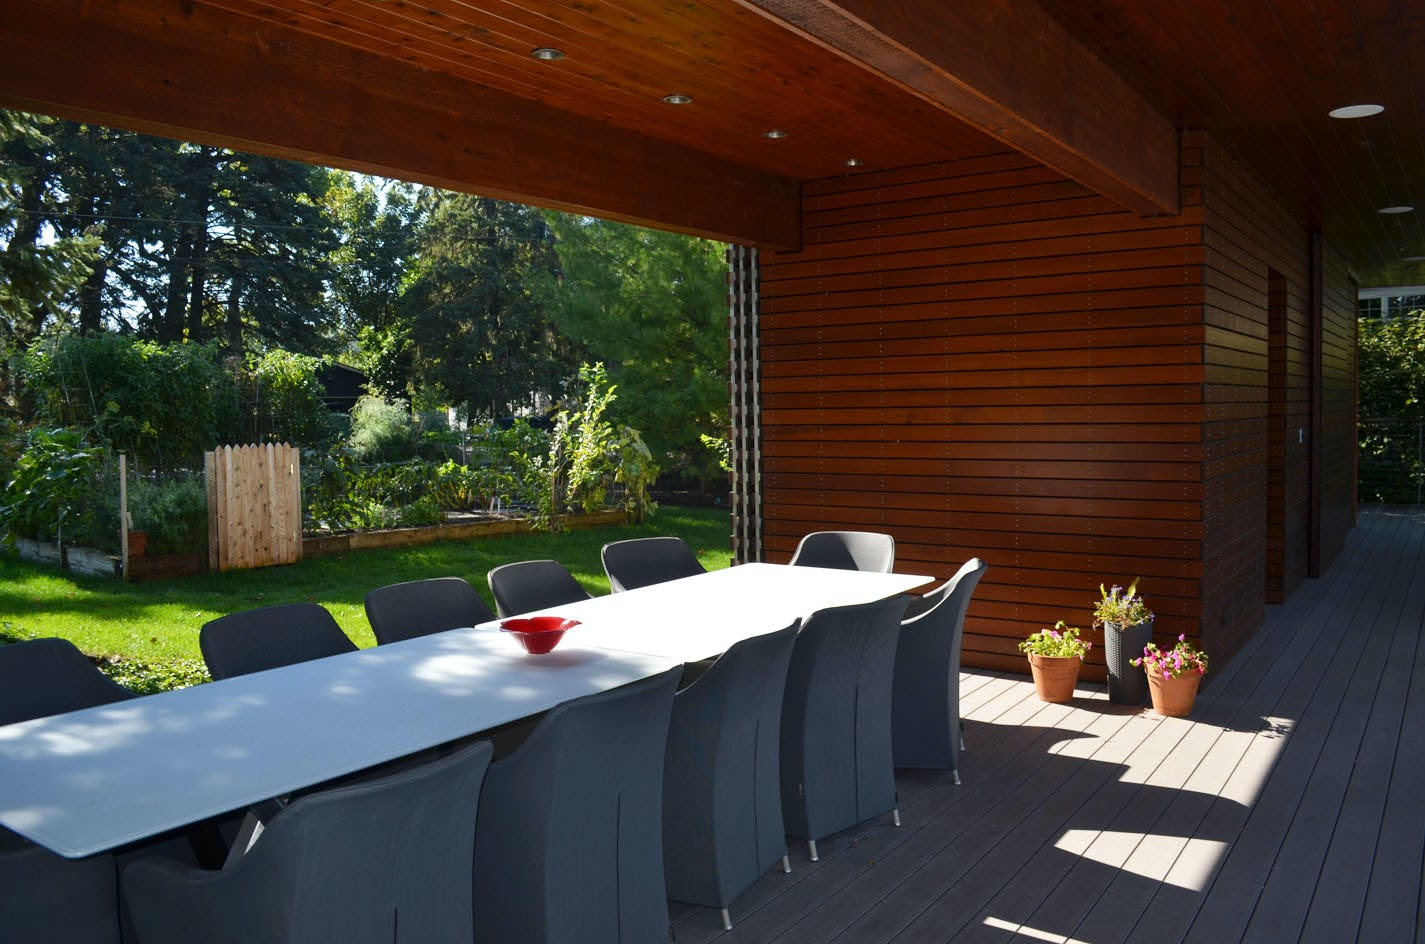 Pool house to garden